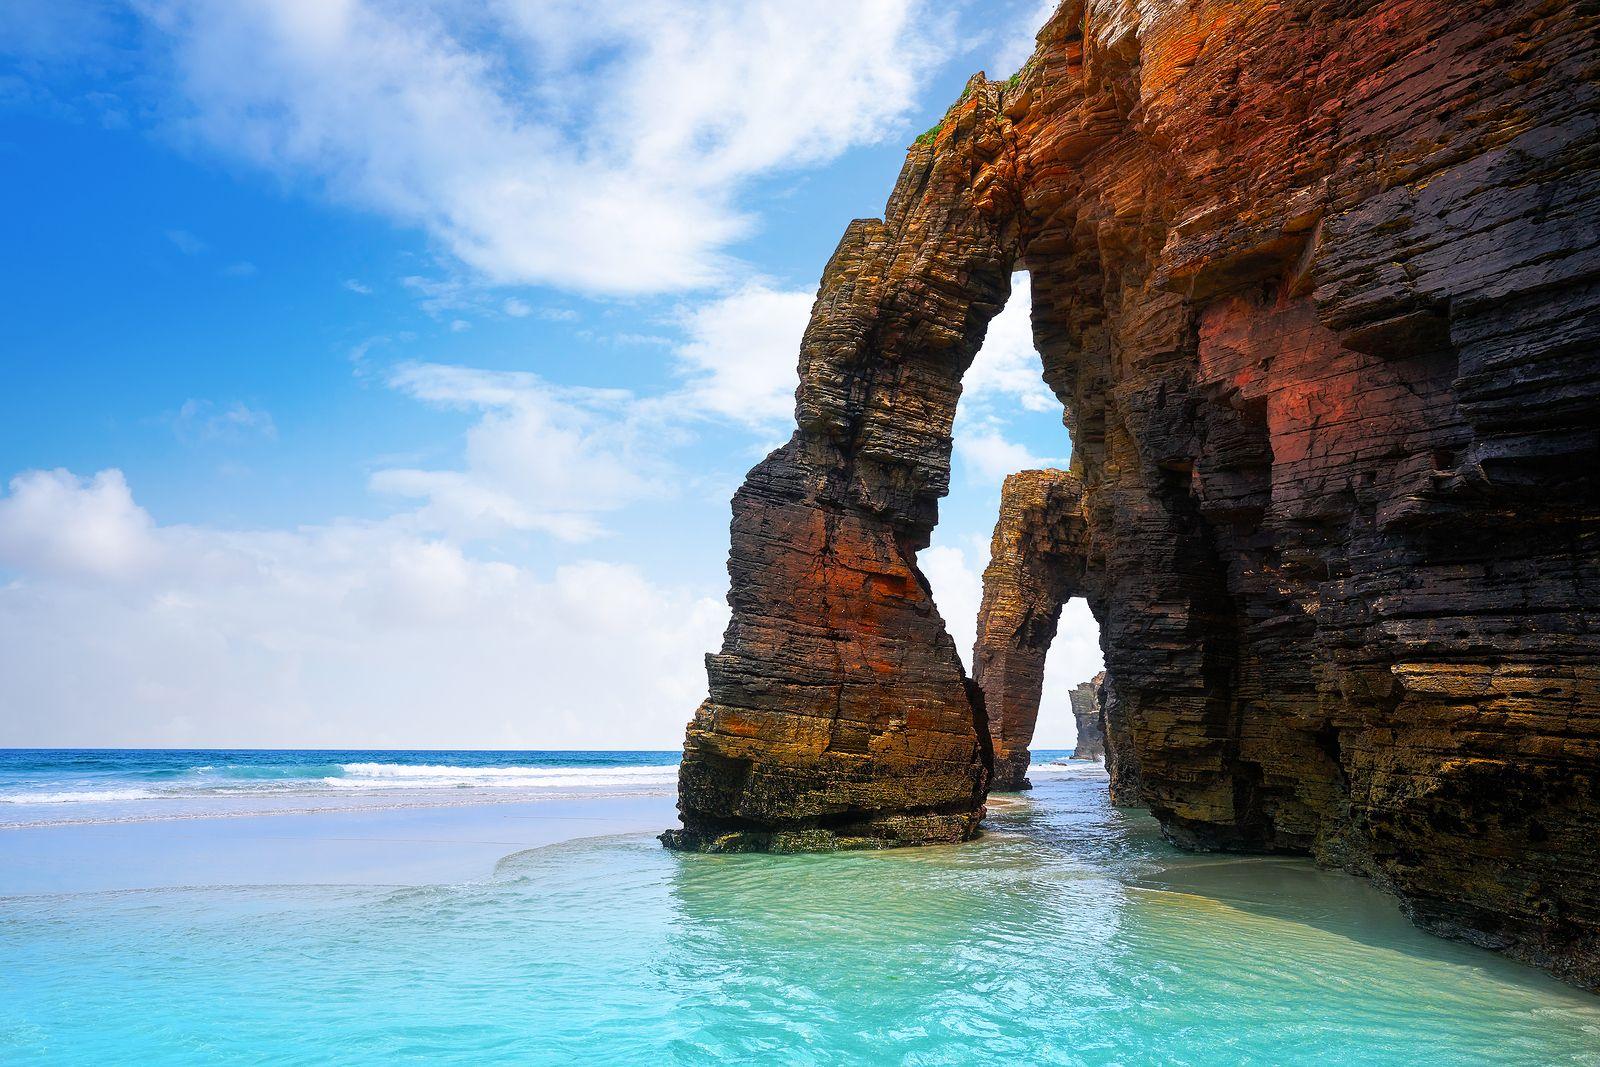 playa-catedrales 3125